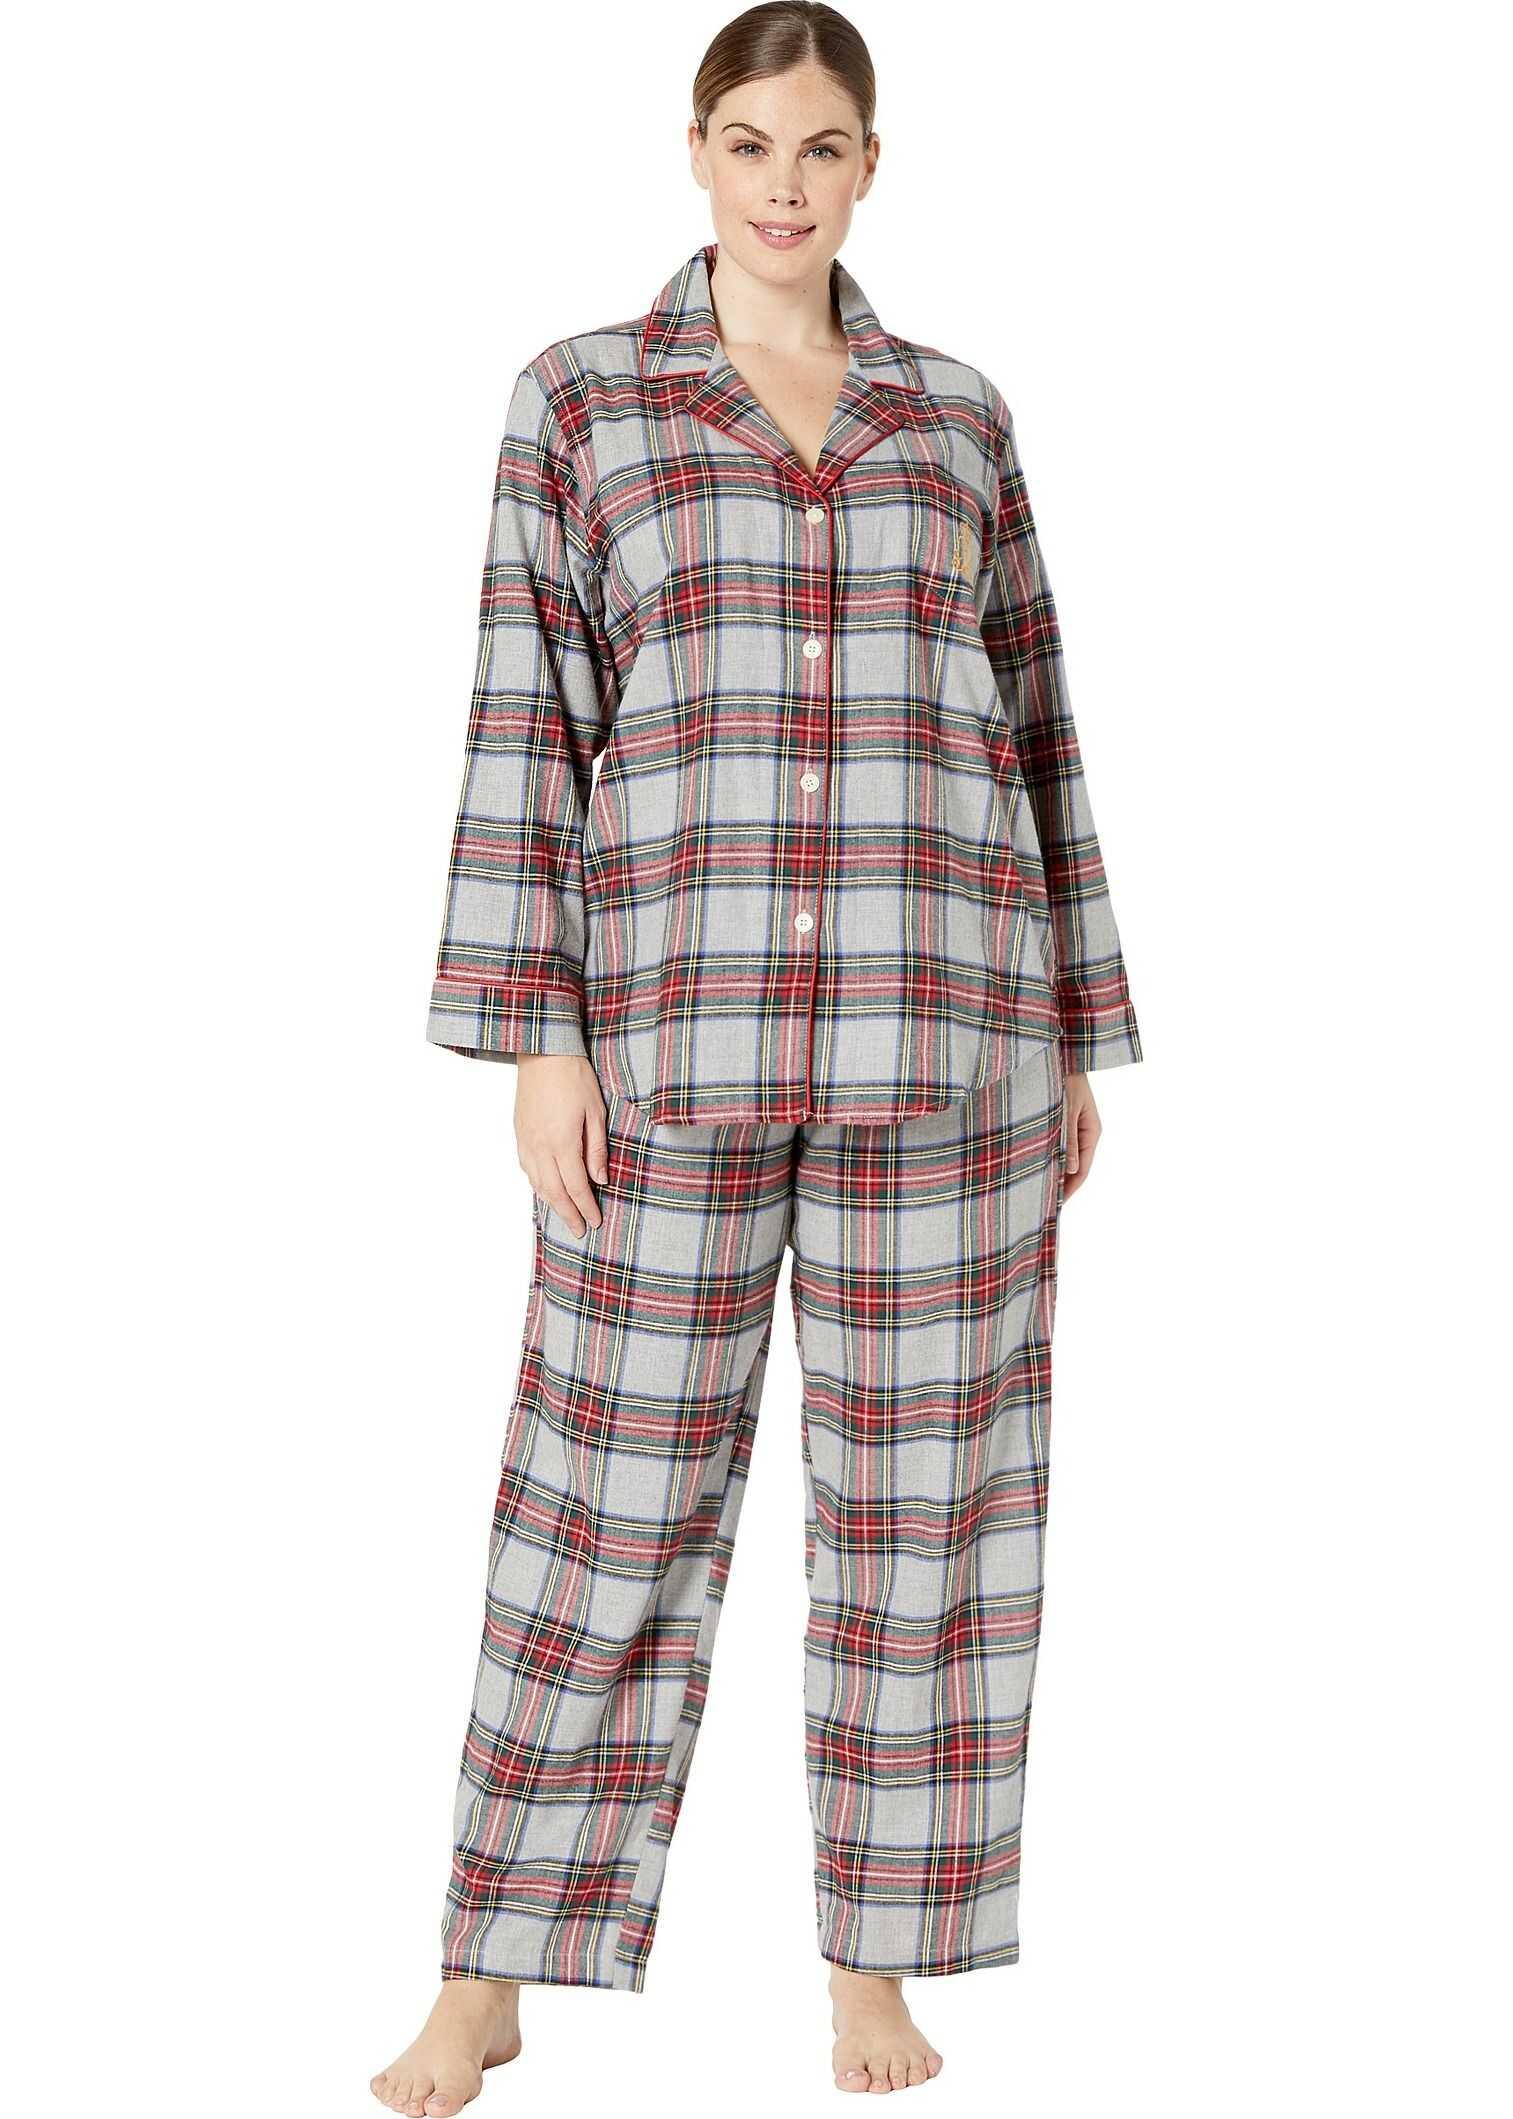 Ralph Lauren Plus Size Brushed Twill Long Sleeve Notch Collar Long Pants Pajama Set Multi Plaid